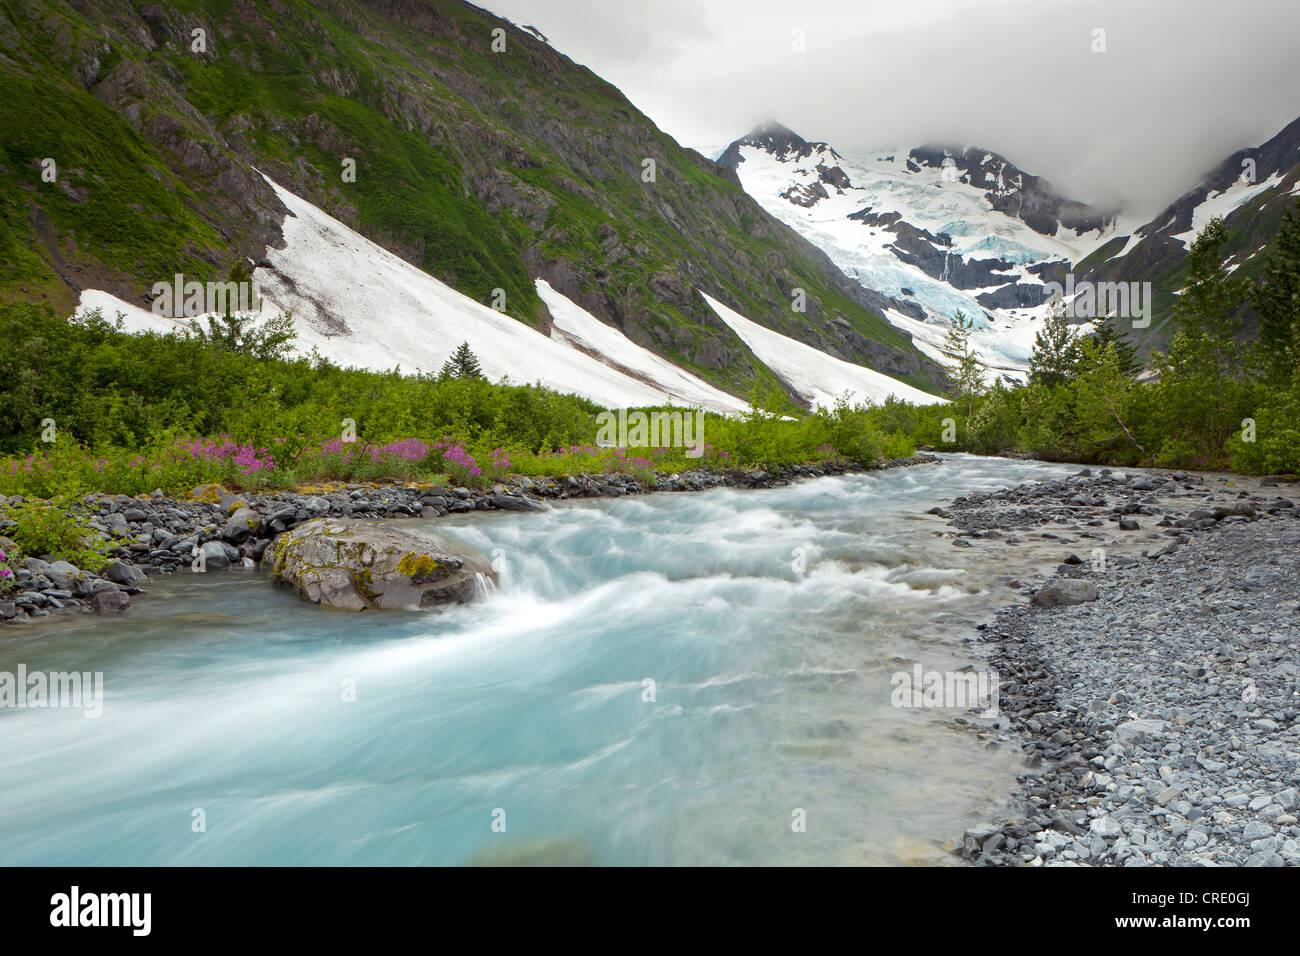 Byron Glacier and river near the Portage Glacier in the Chugach Mountains, Kenai Peninsula, Alaska, USA Stock Photo